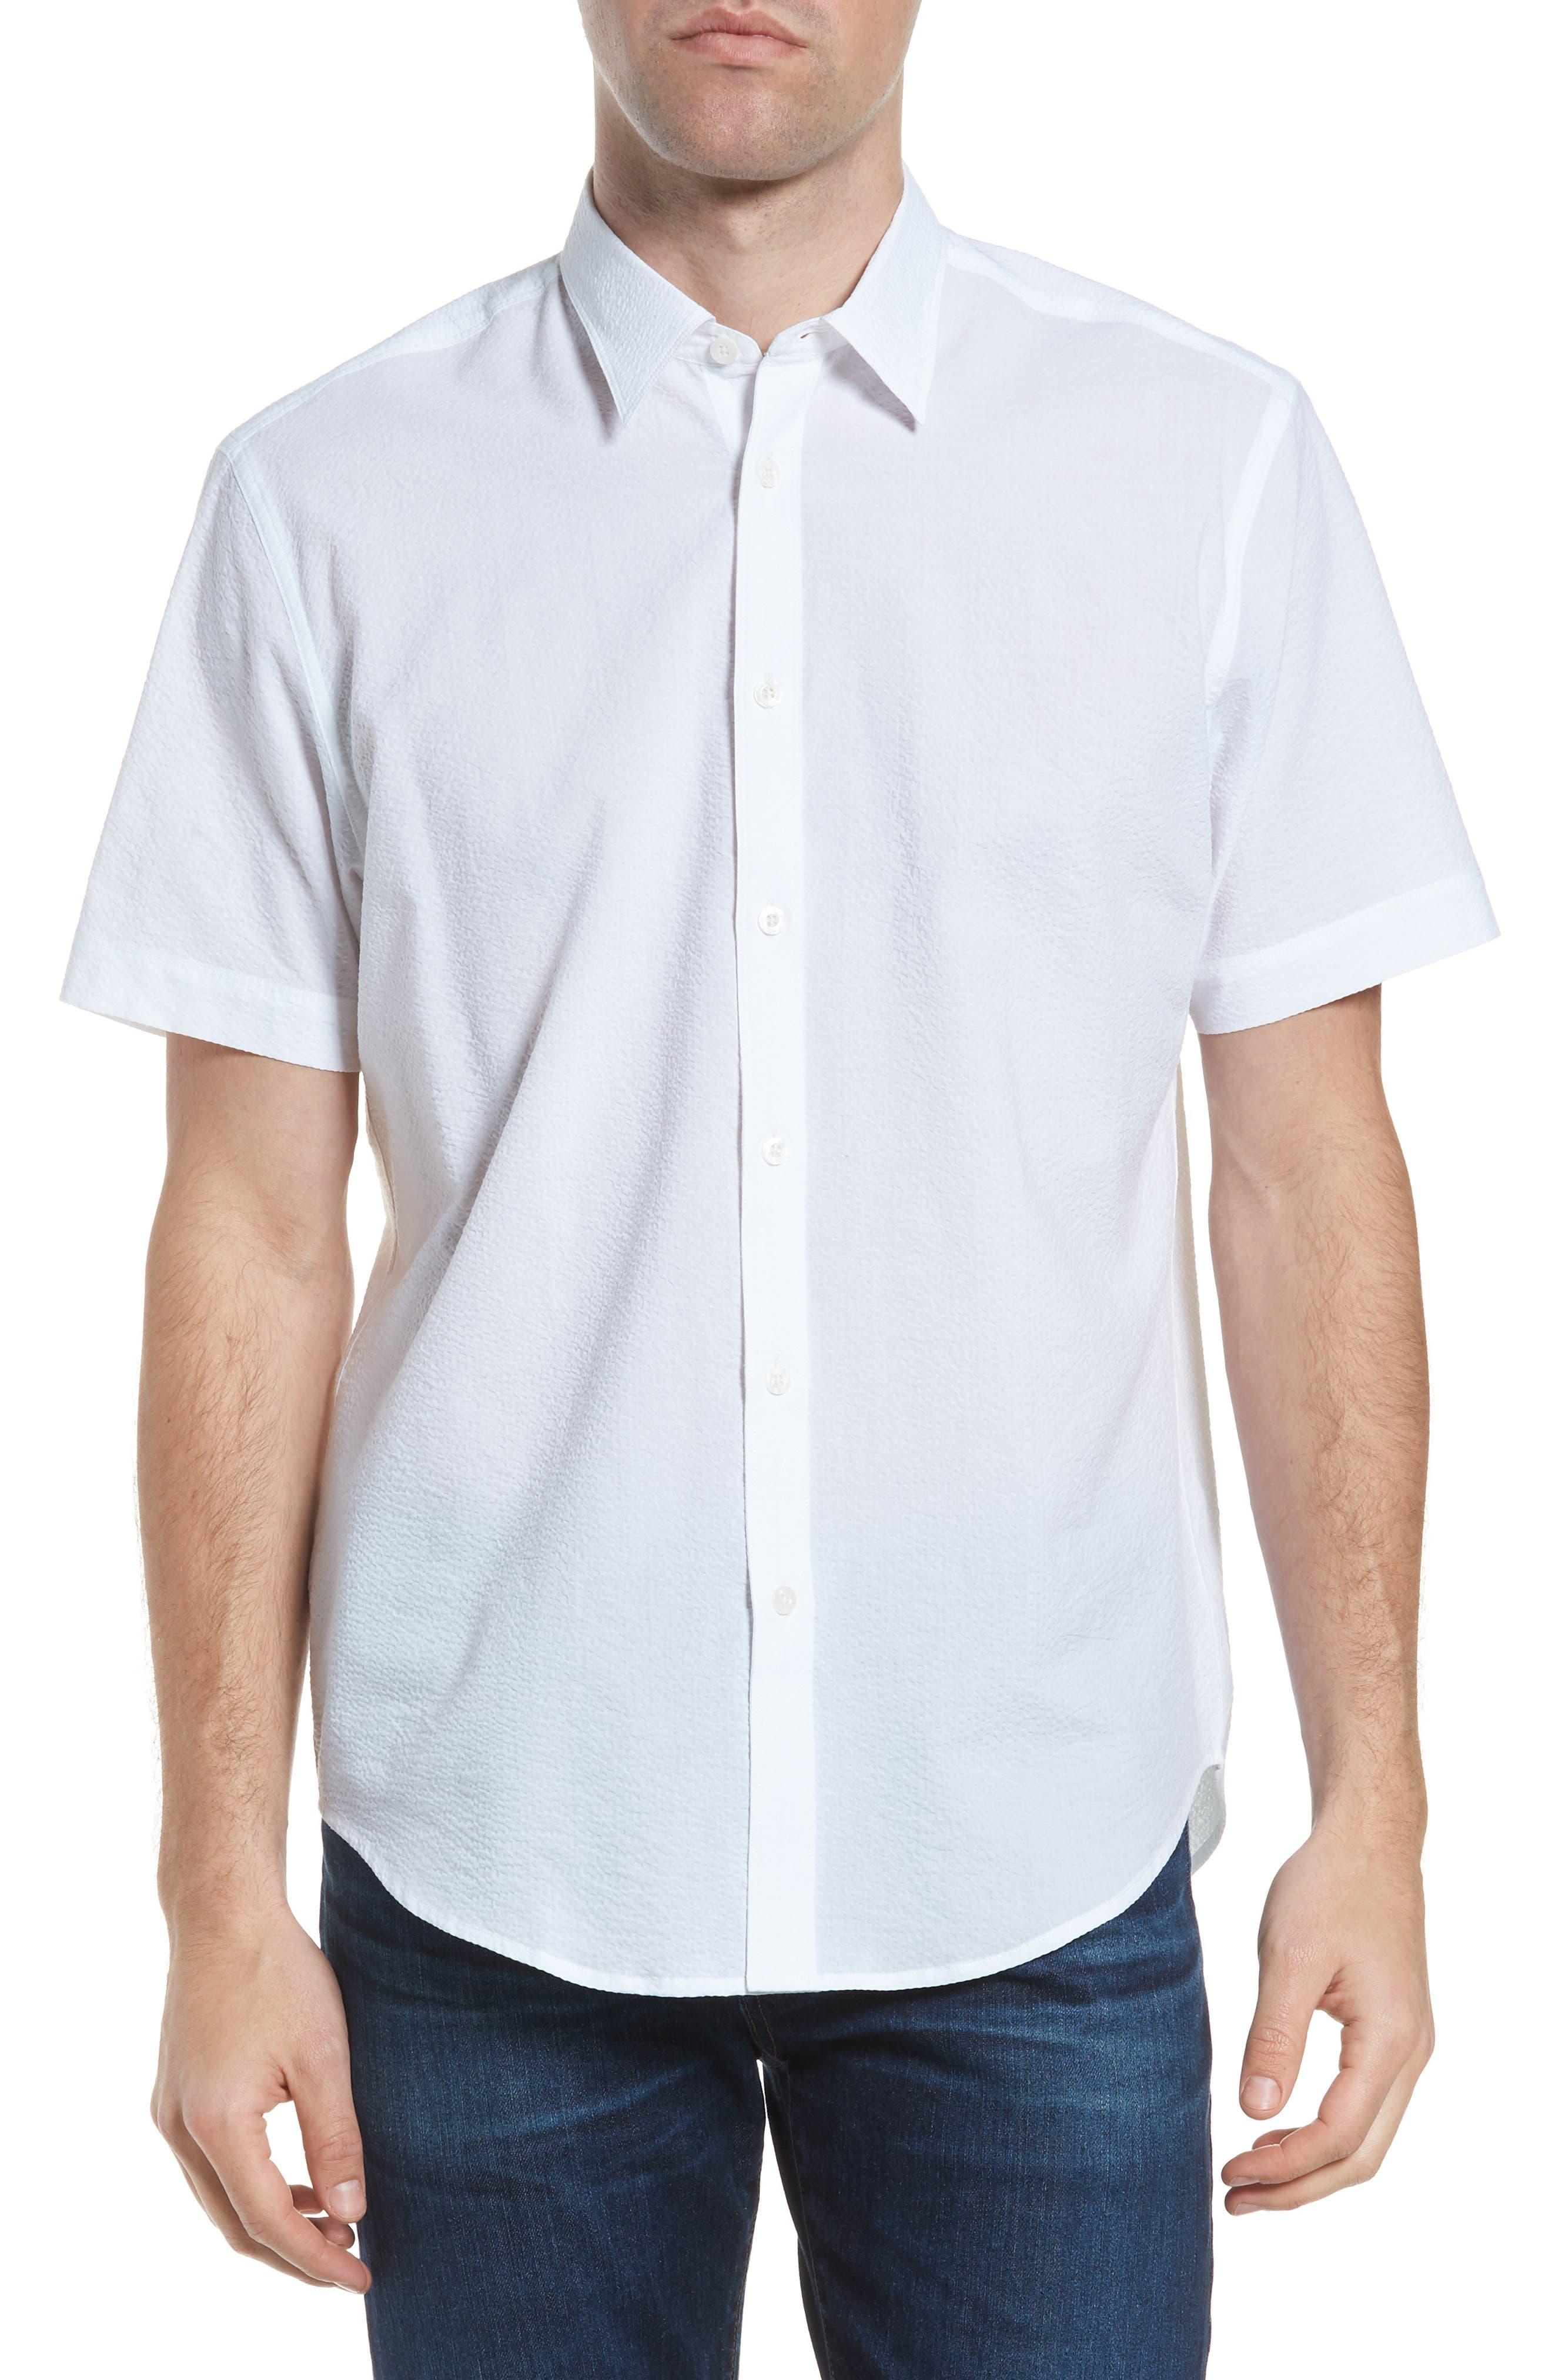 Coastaoro Sucker Regular Fit Seersucker Sport Shirt